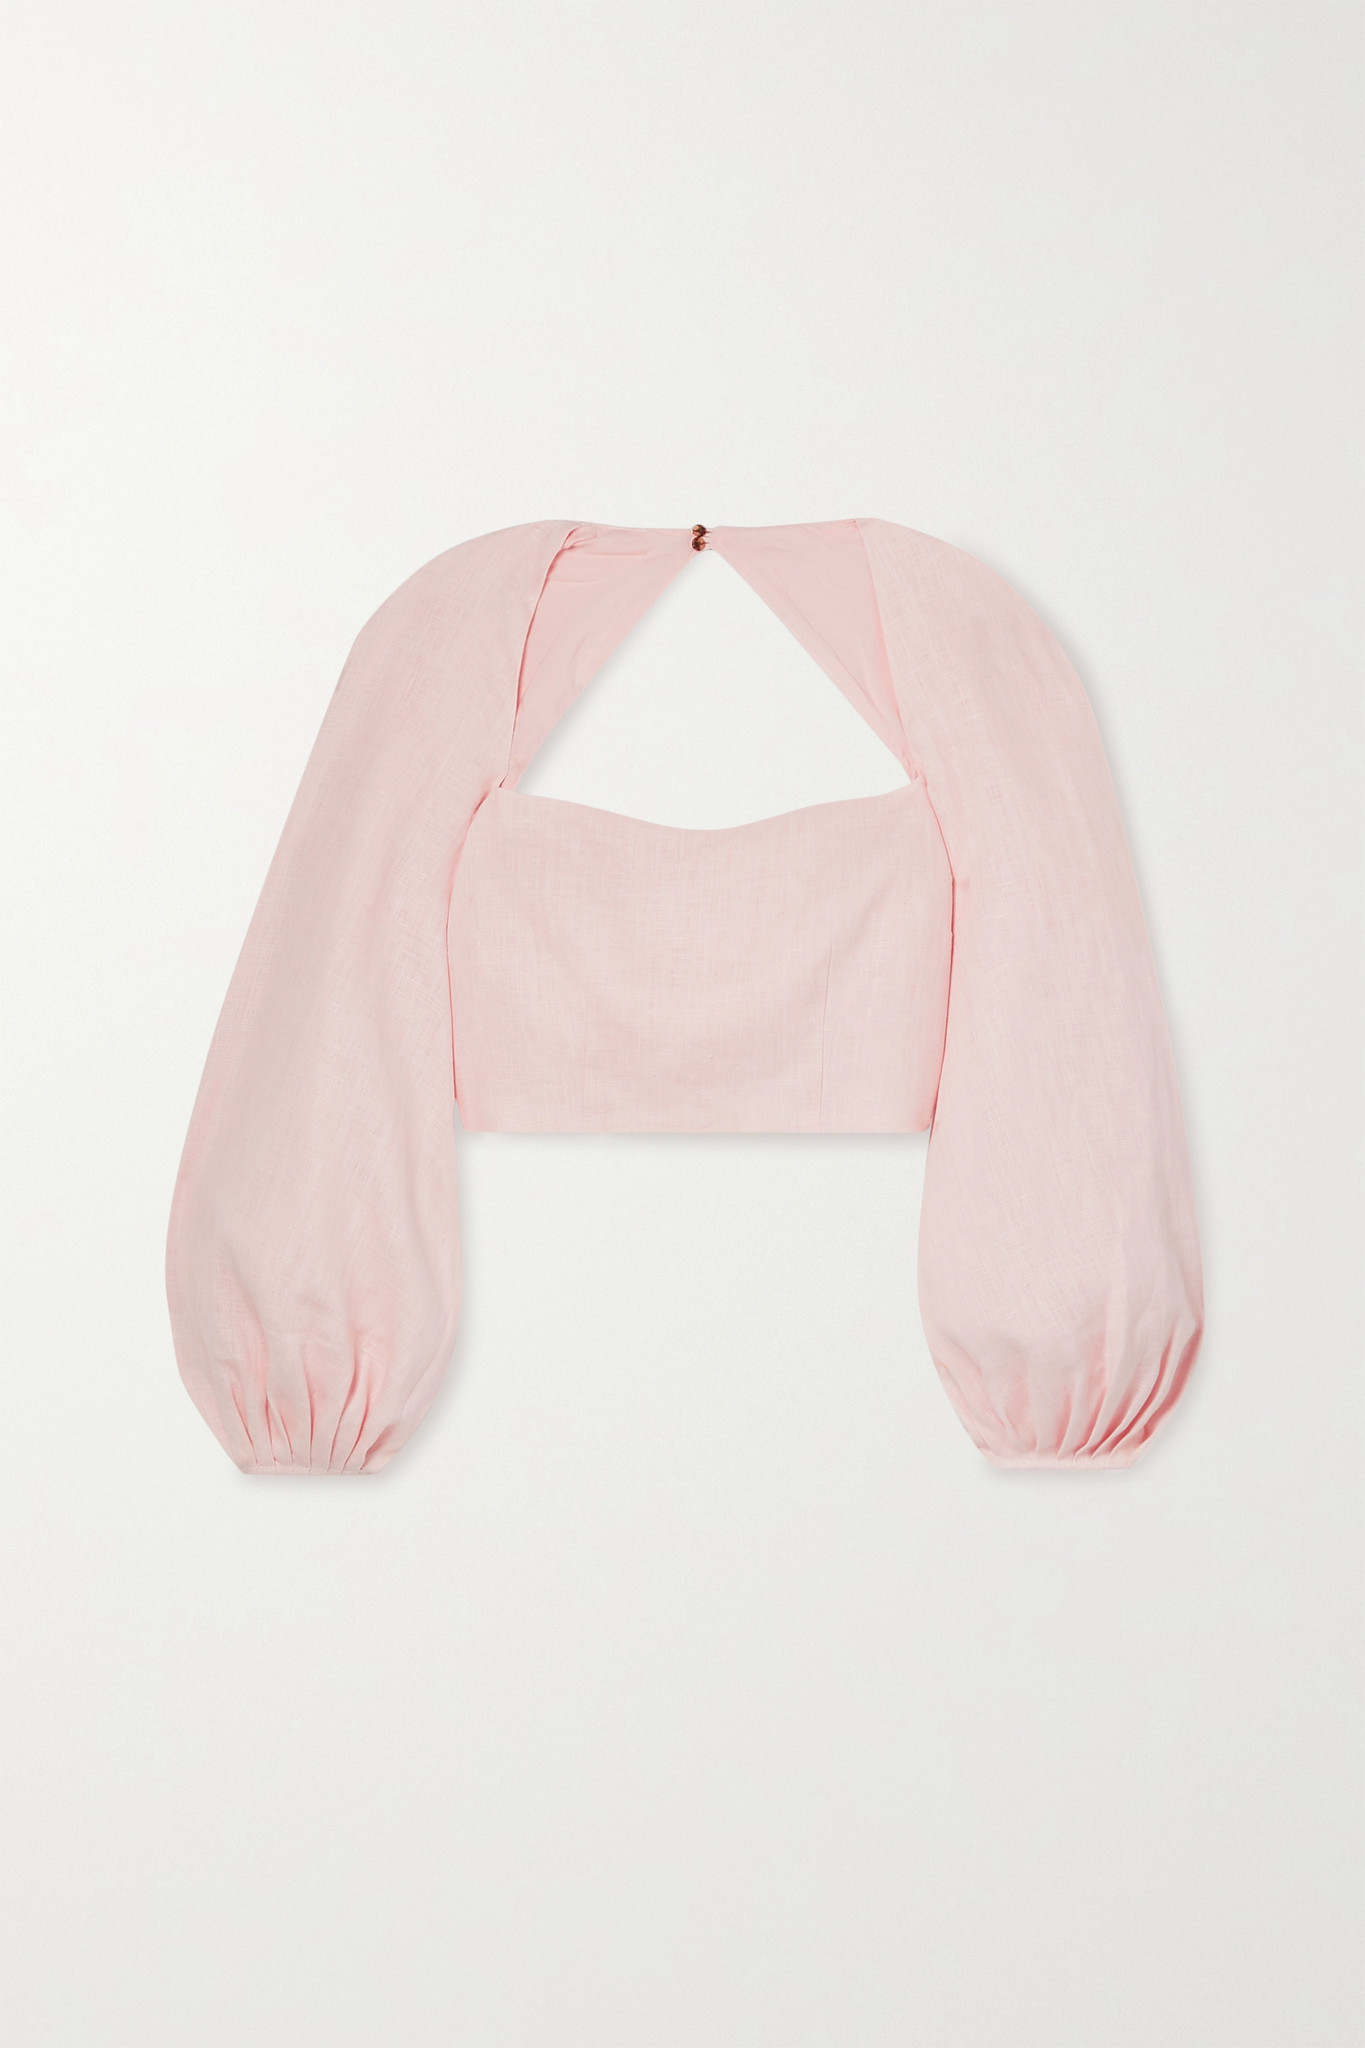 MARA HOFFMAN - 【net Sustain】moon 挖剪汉麻短款上衣 - 粉红色 - US2